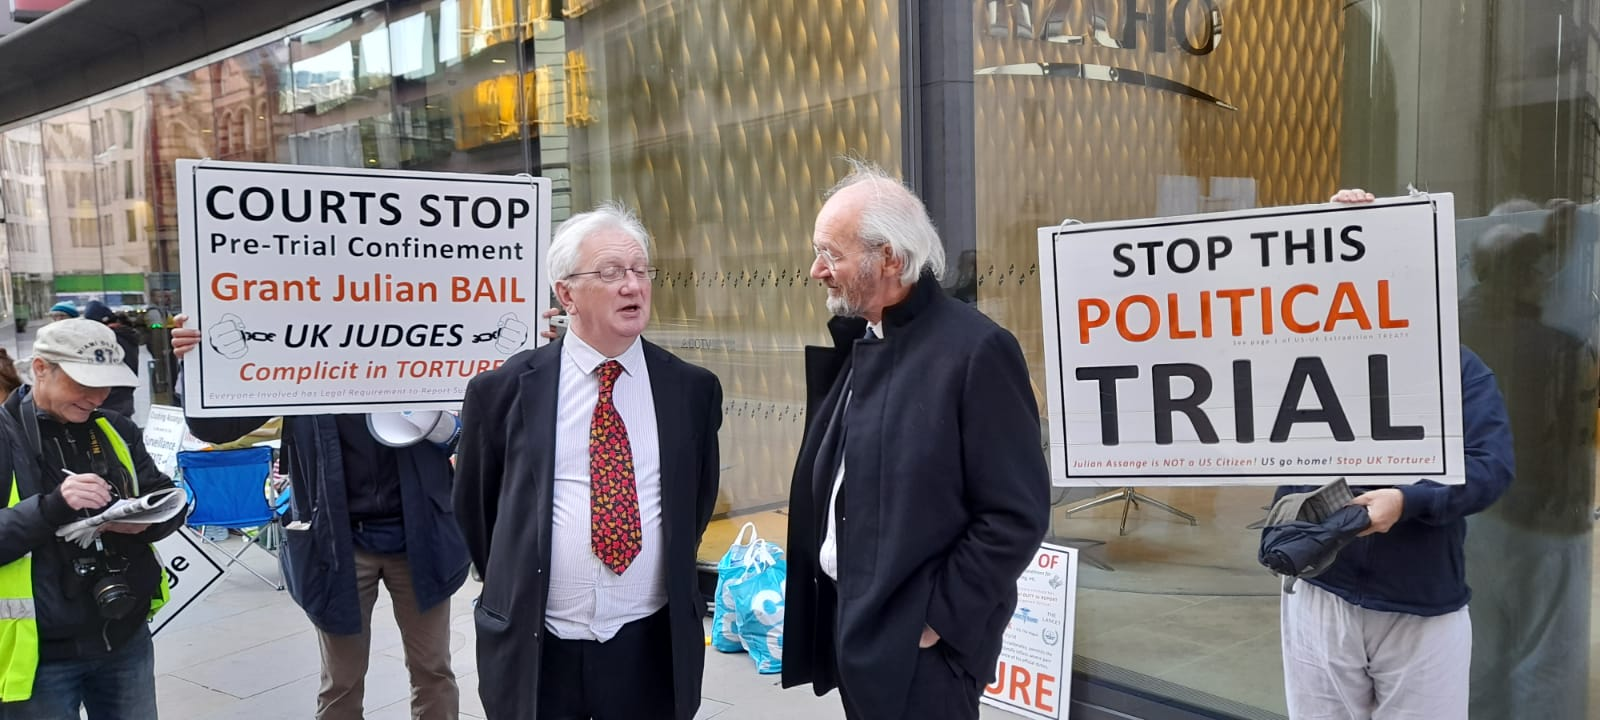 protest_photos:img-20200928-wa0029.jpg